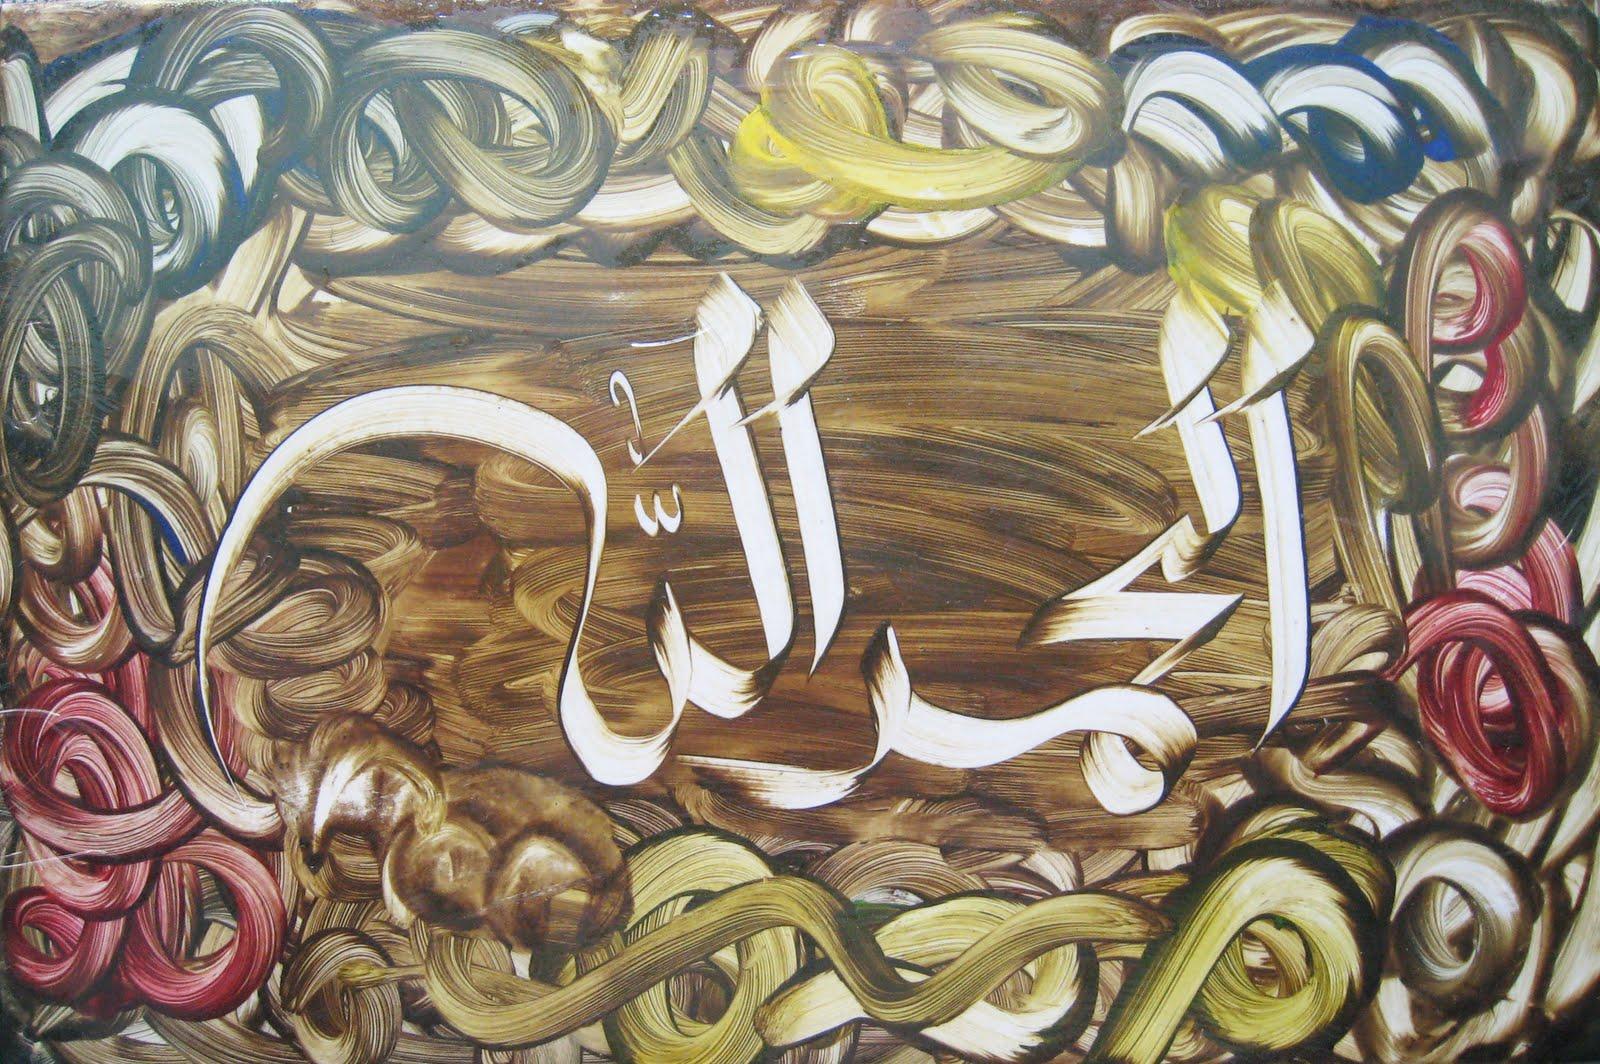 Arabic Calligraphy Quran GRAPHIC DESIGNER: CALL...